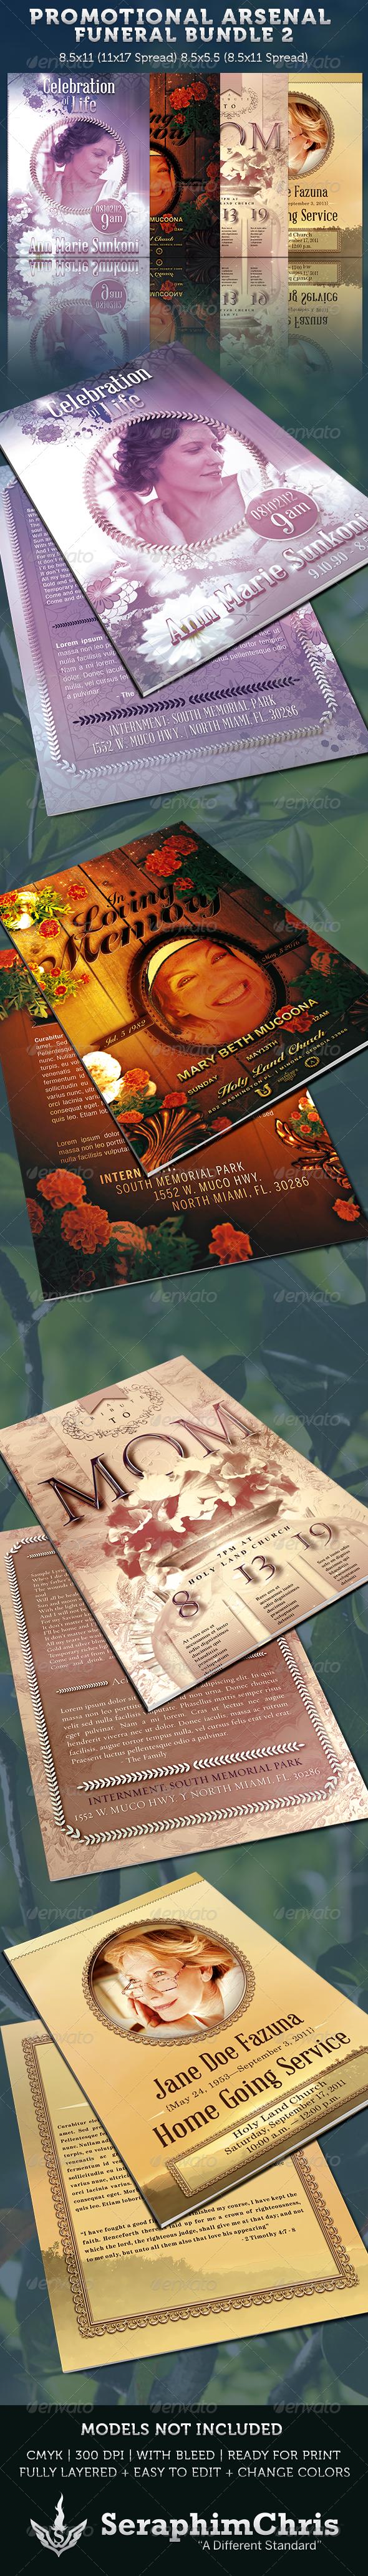 GraphicRiver Promotional Arsenal Funeral Program Bundle 2 3656537